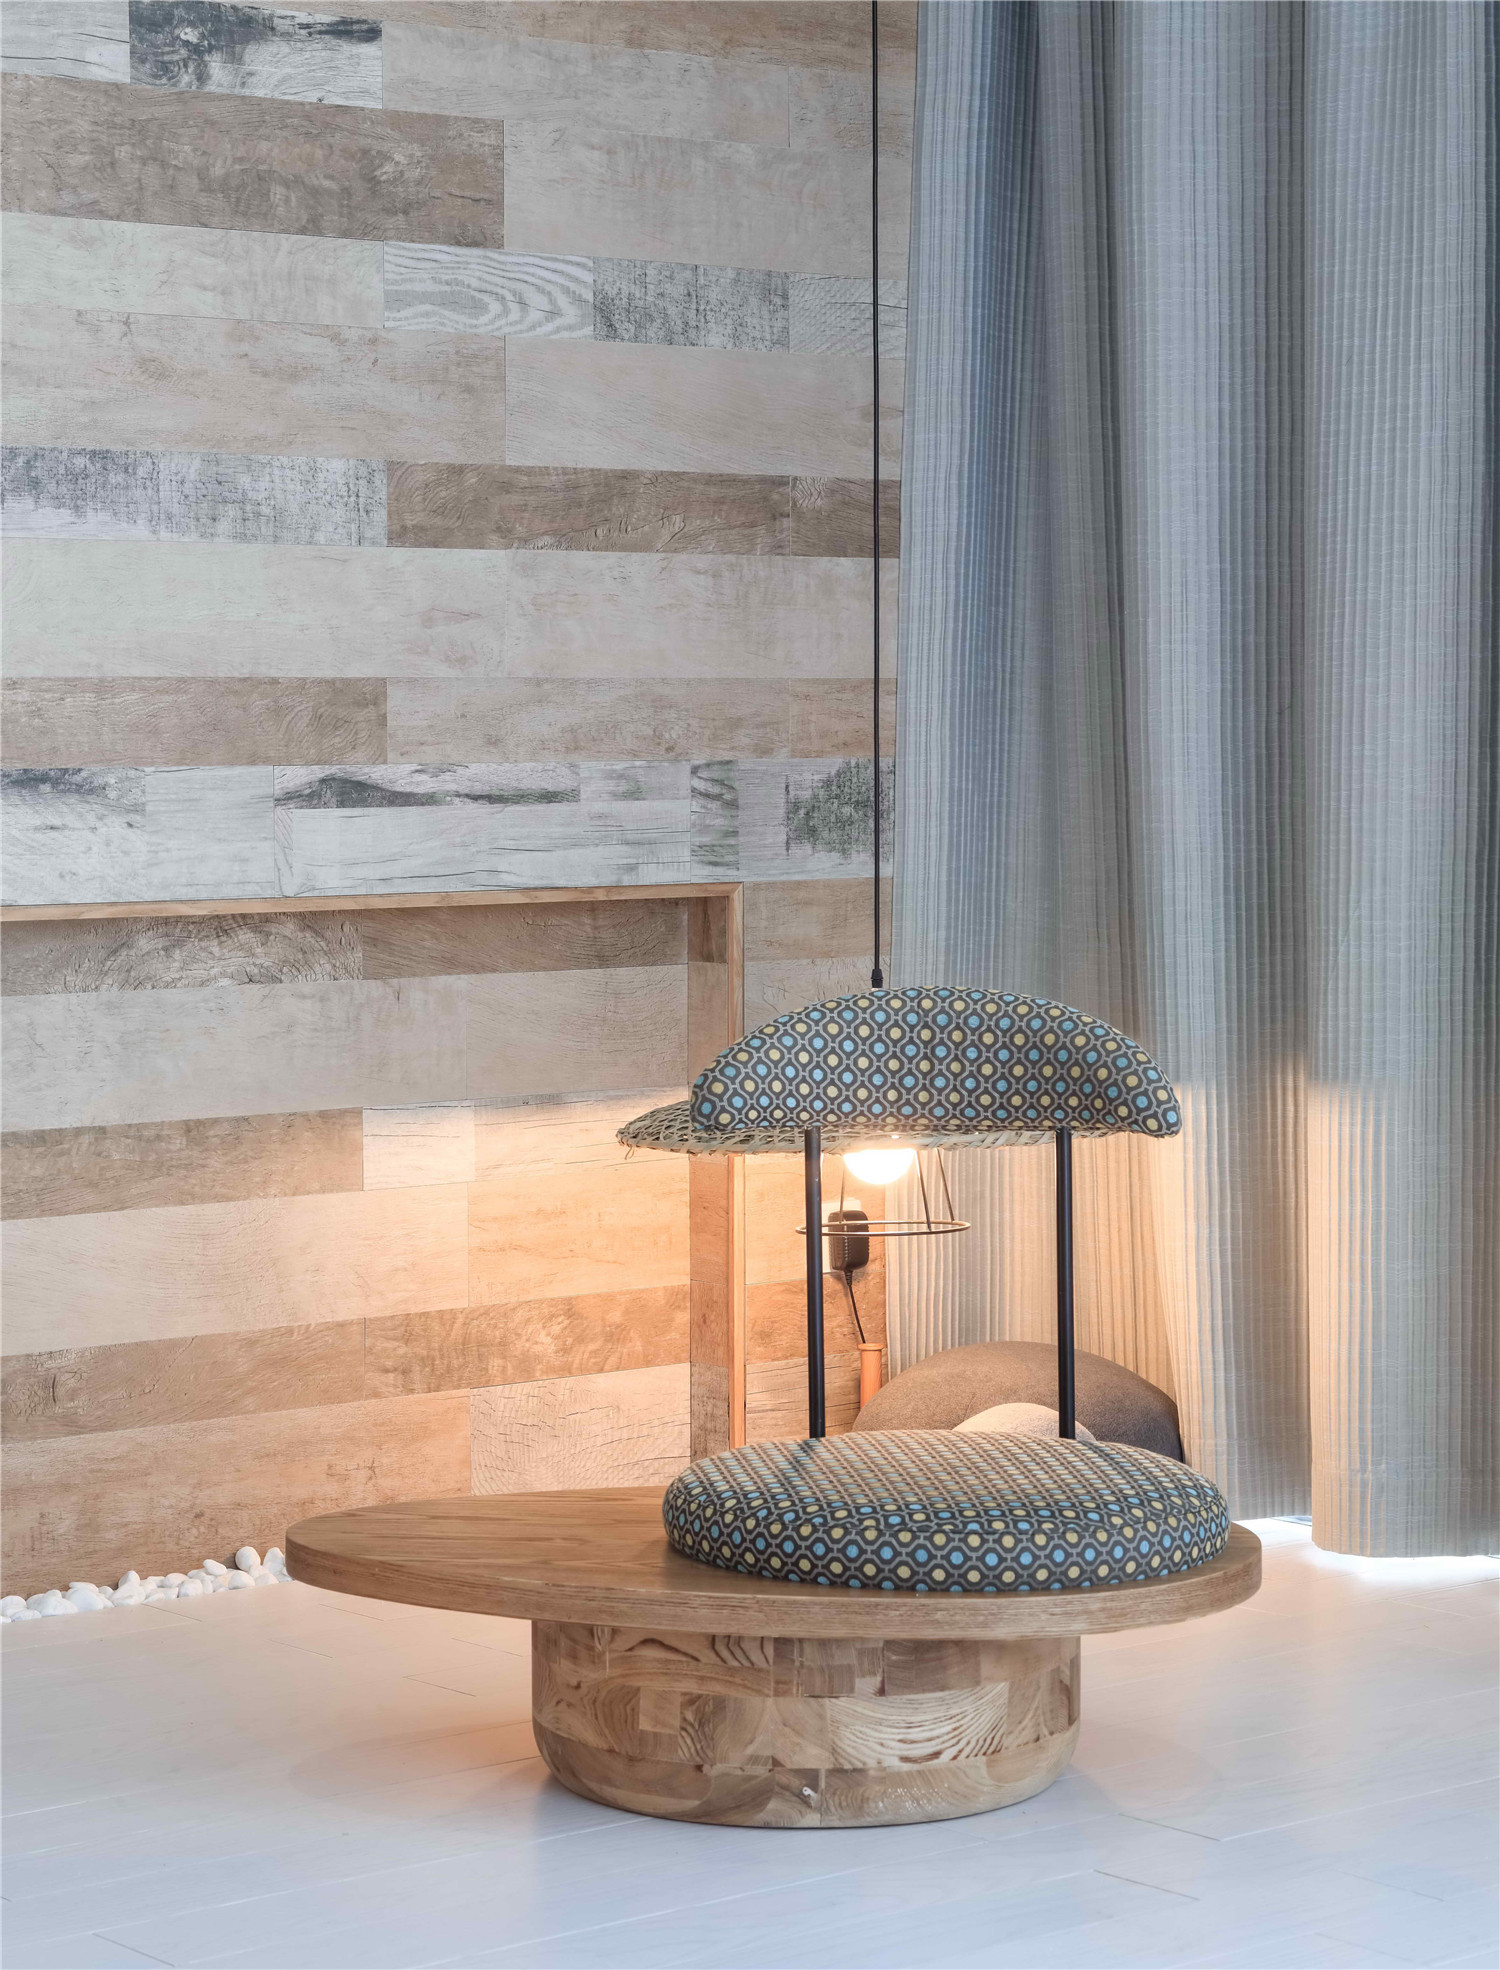 Ripple Hotel - Qiandao Lake design brief Hisheji (184)